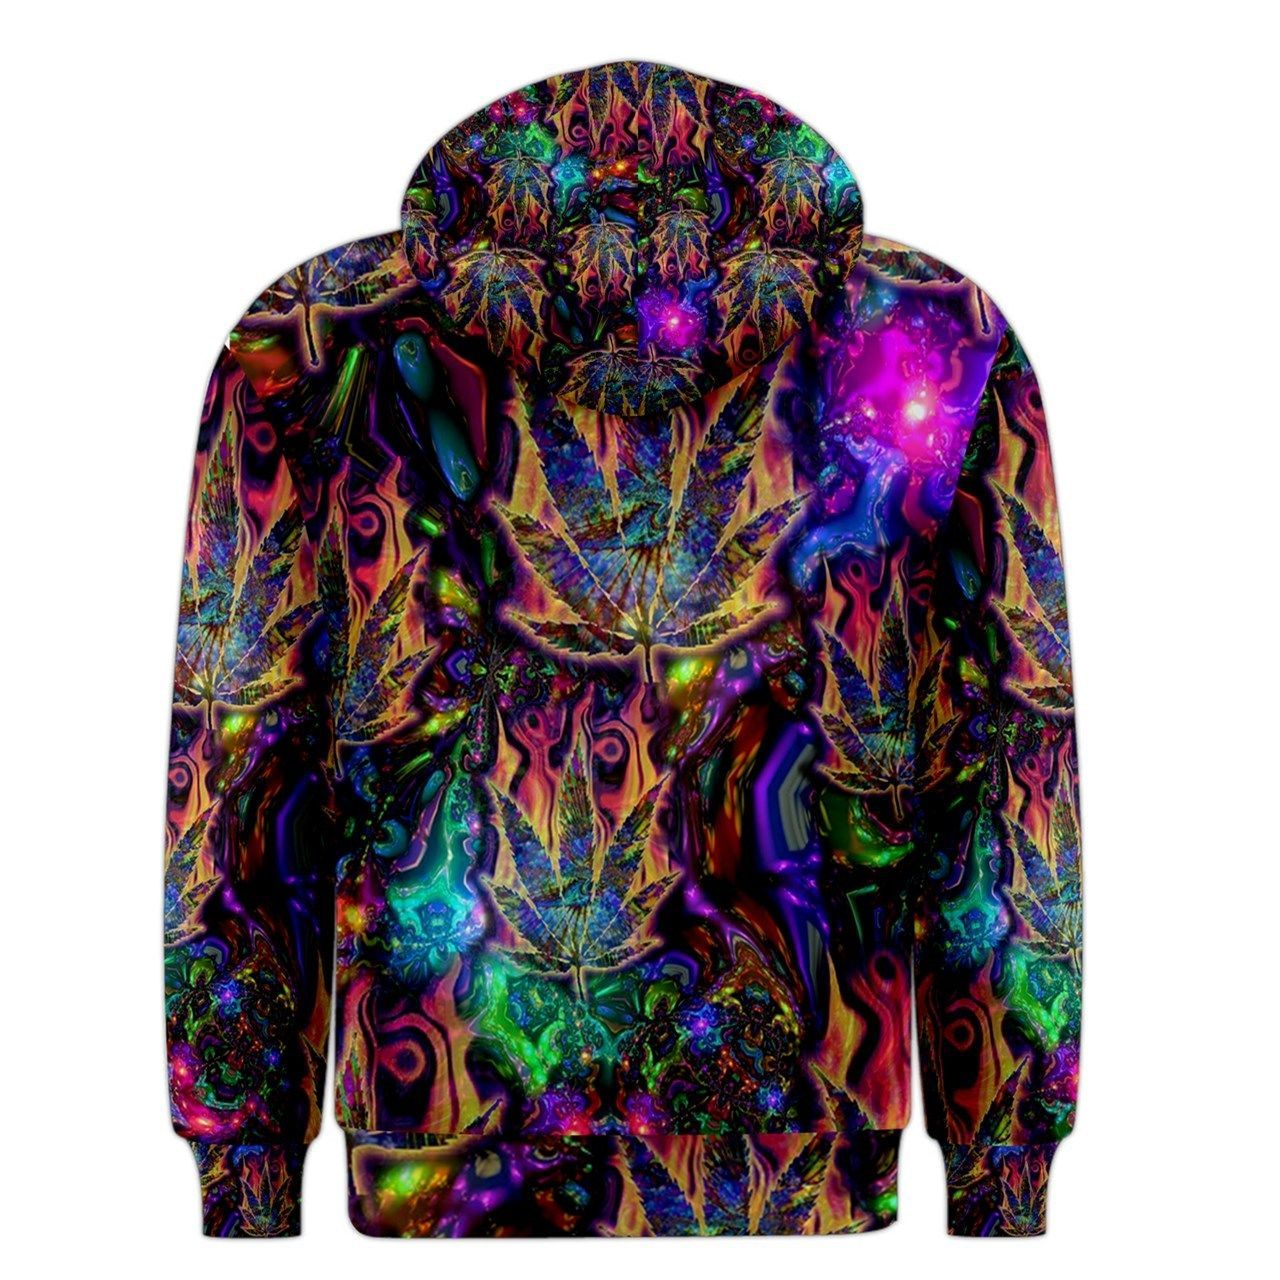 Psychedelic hoodie